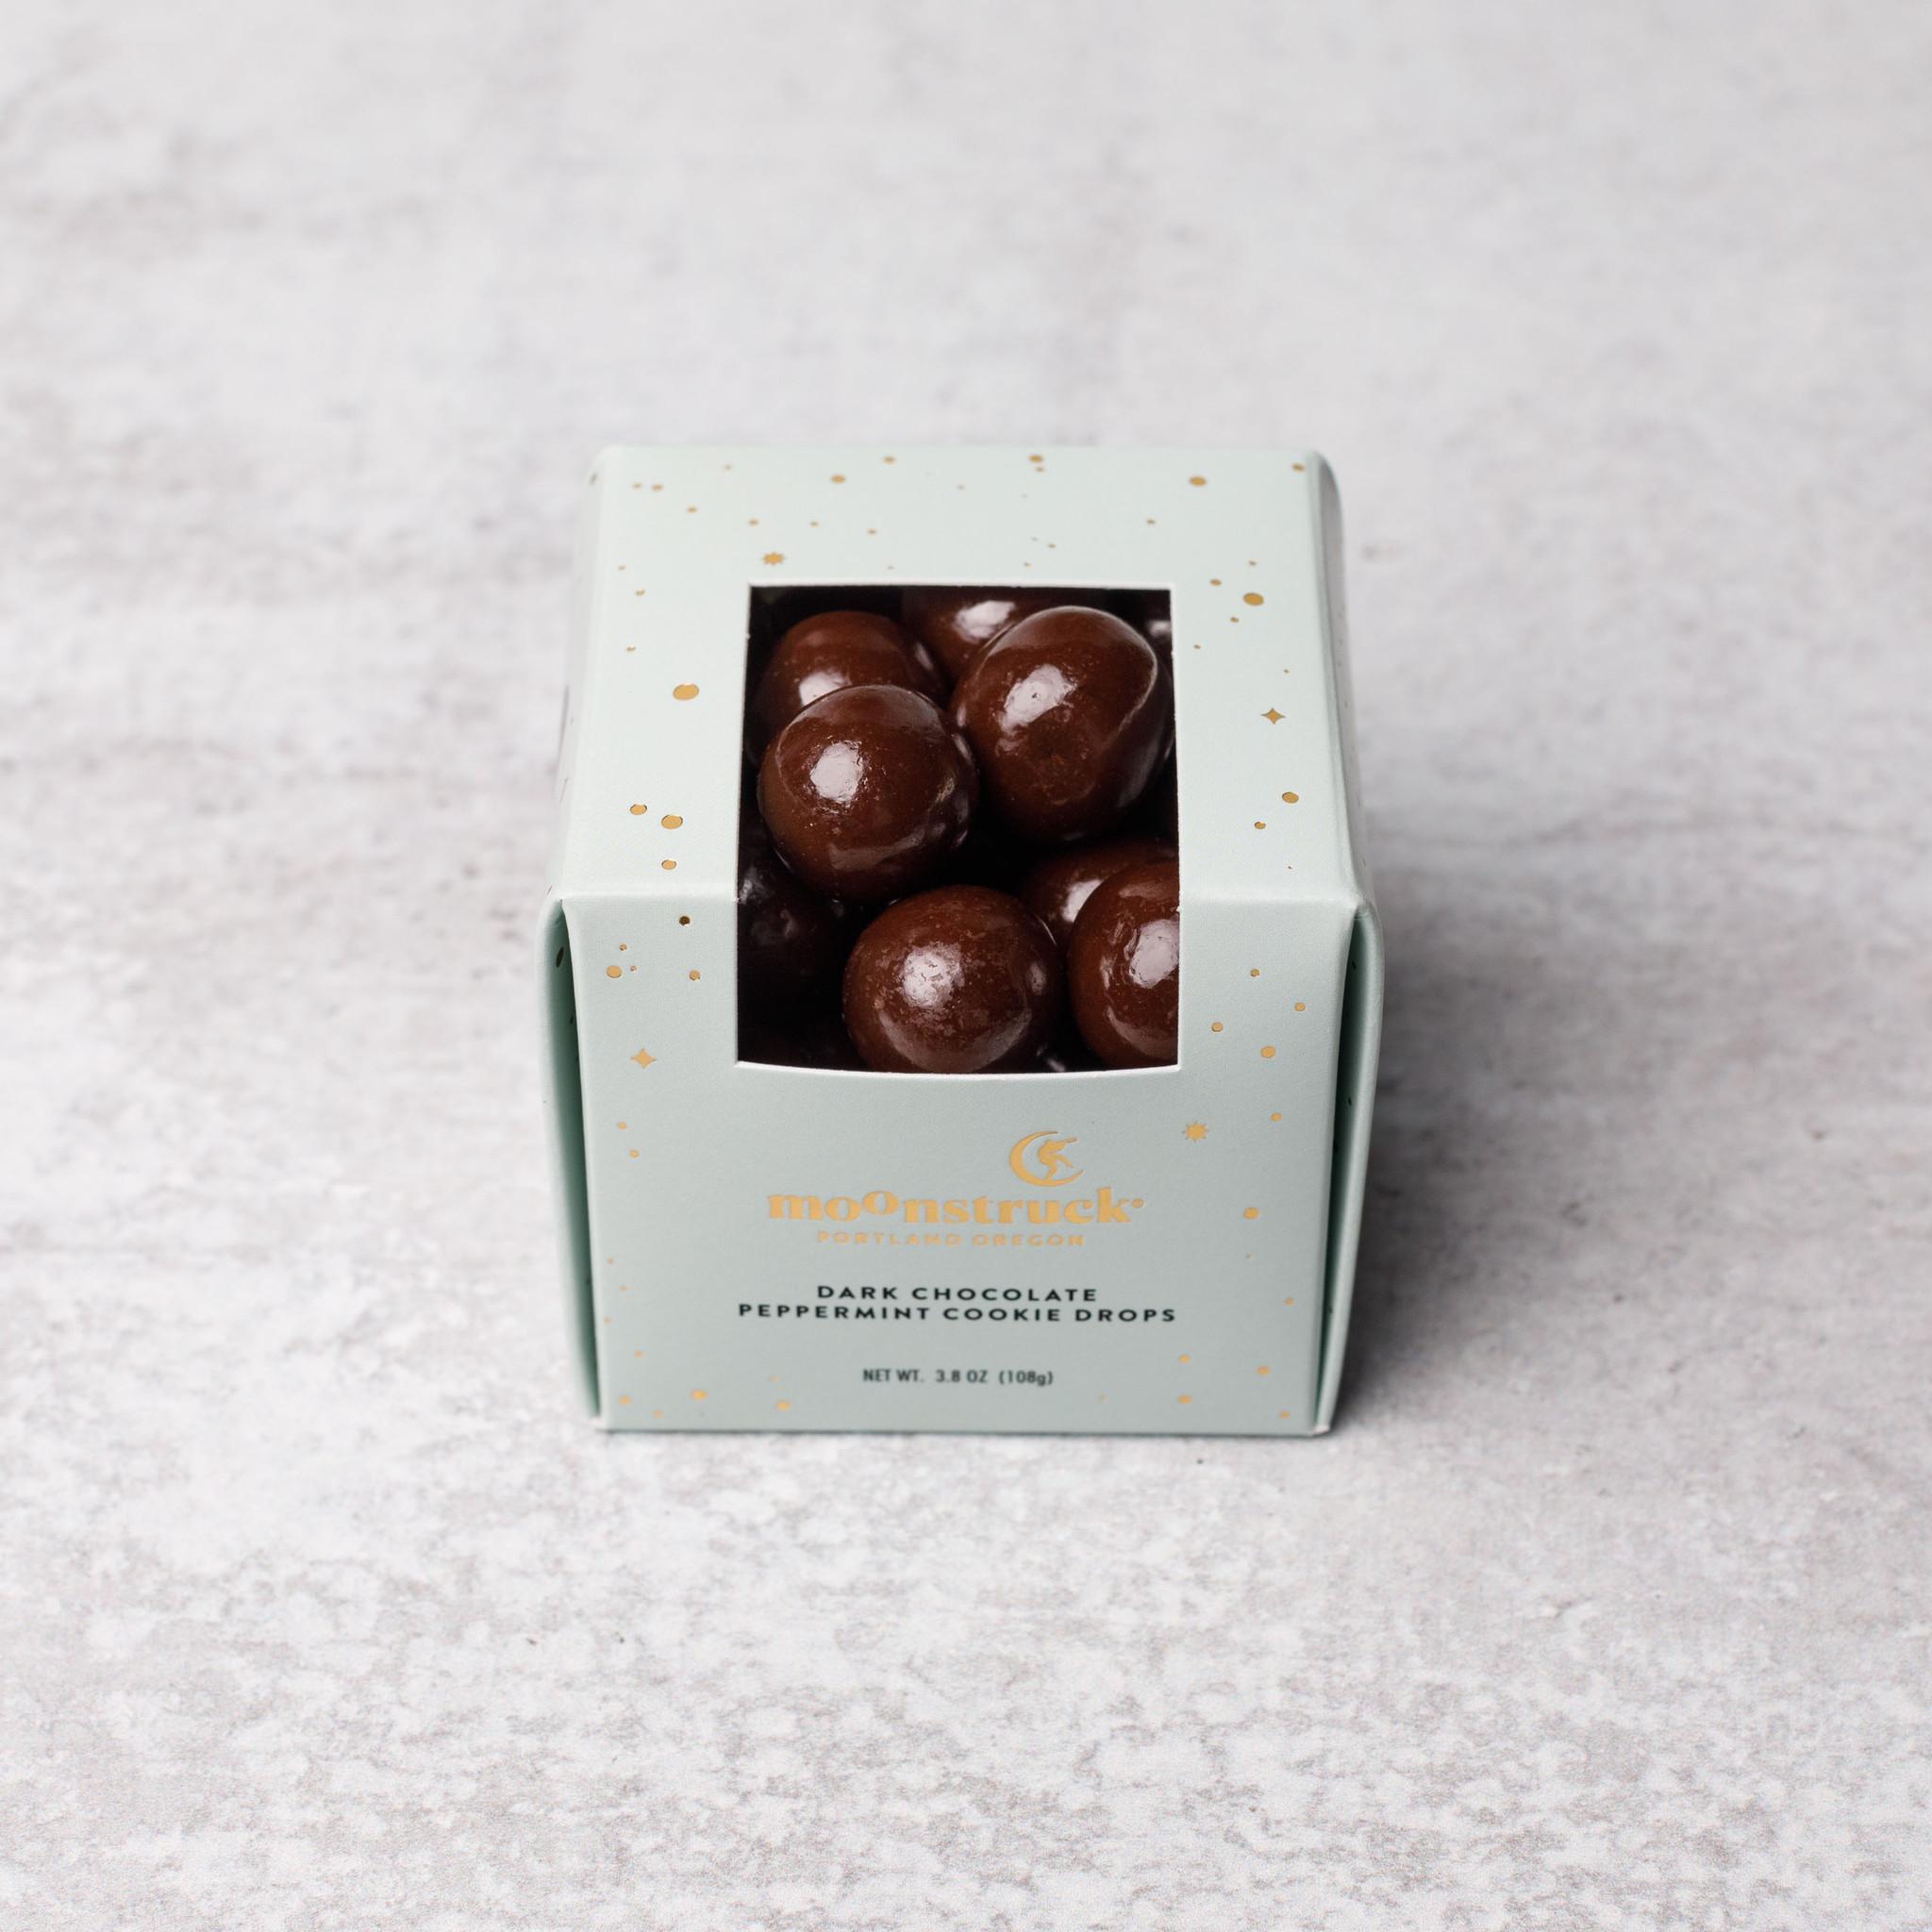 Dark Chocolate Peppermint Cookie Drops